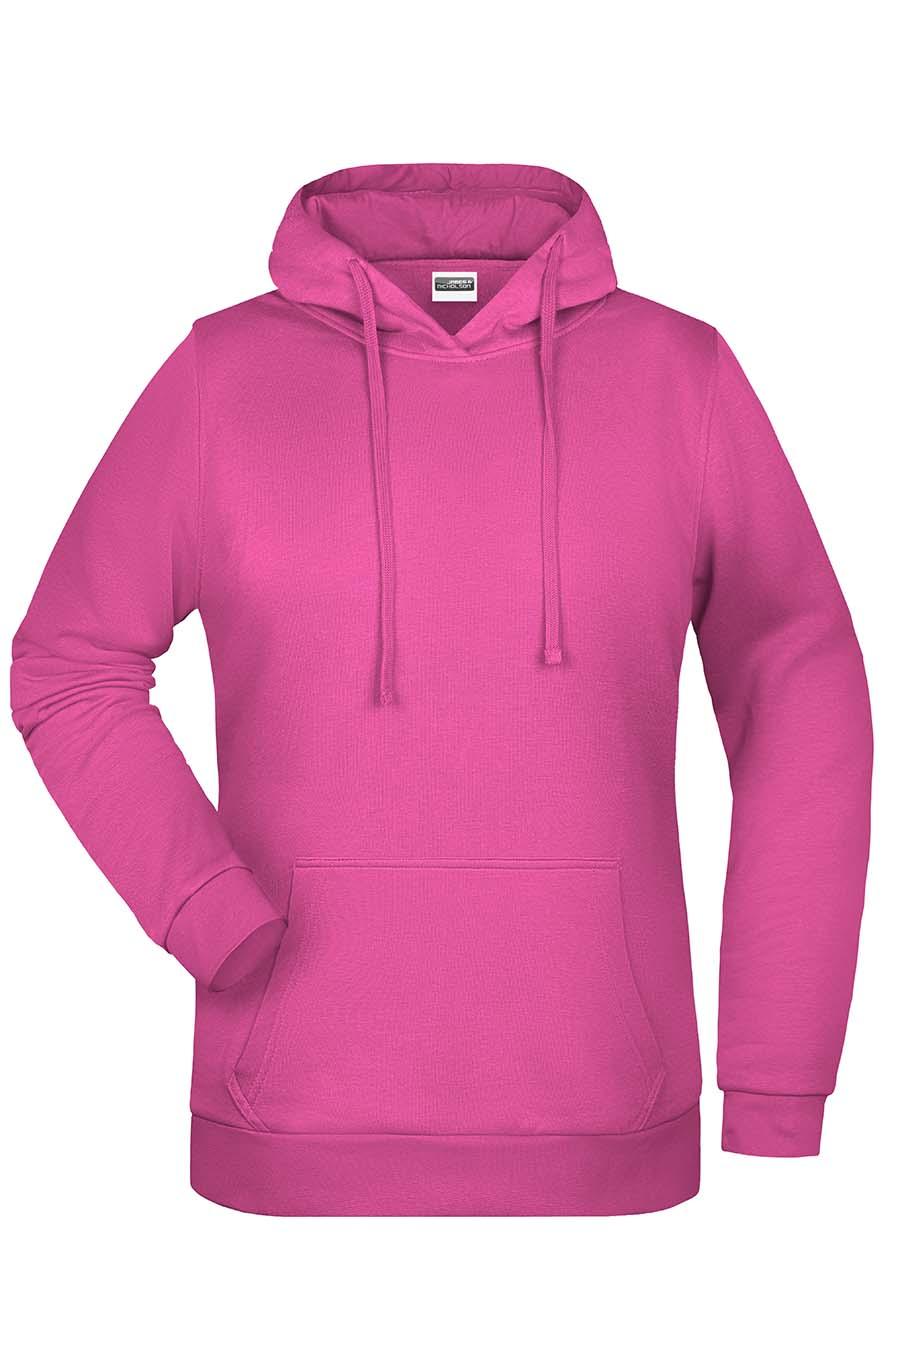 Sweat-shirt capuche femme - 20-1494-16